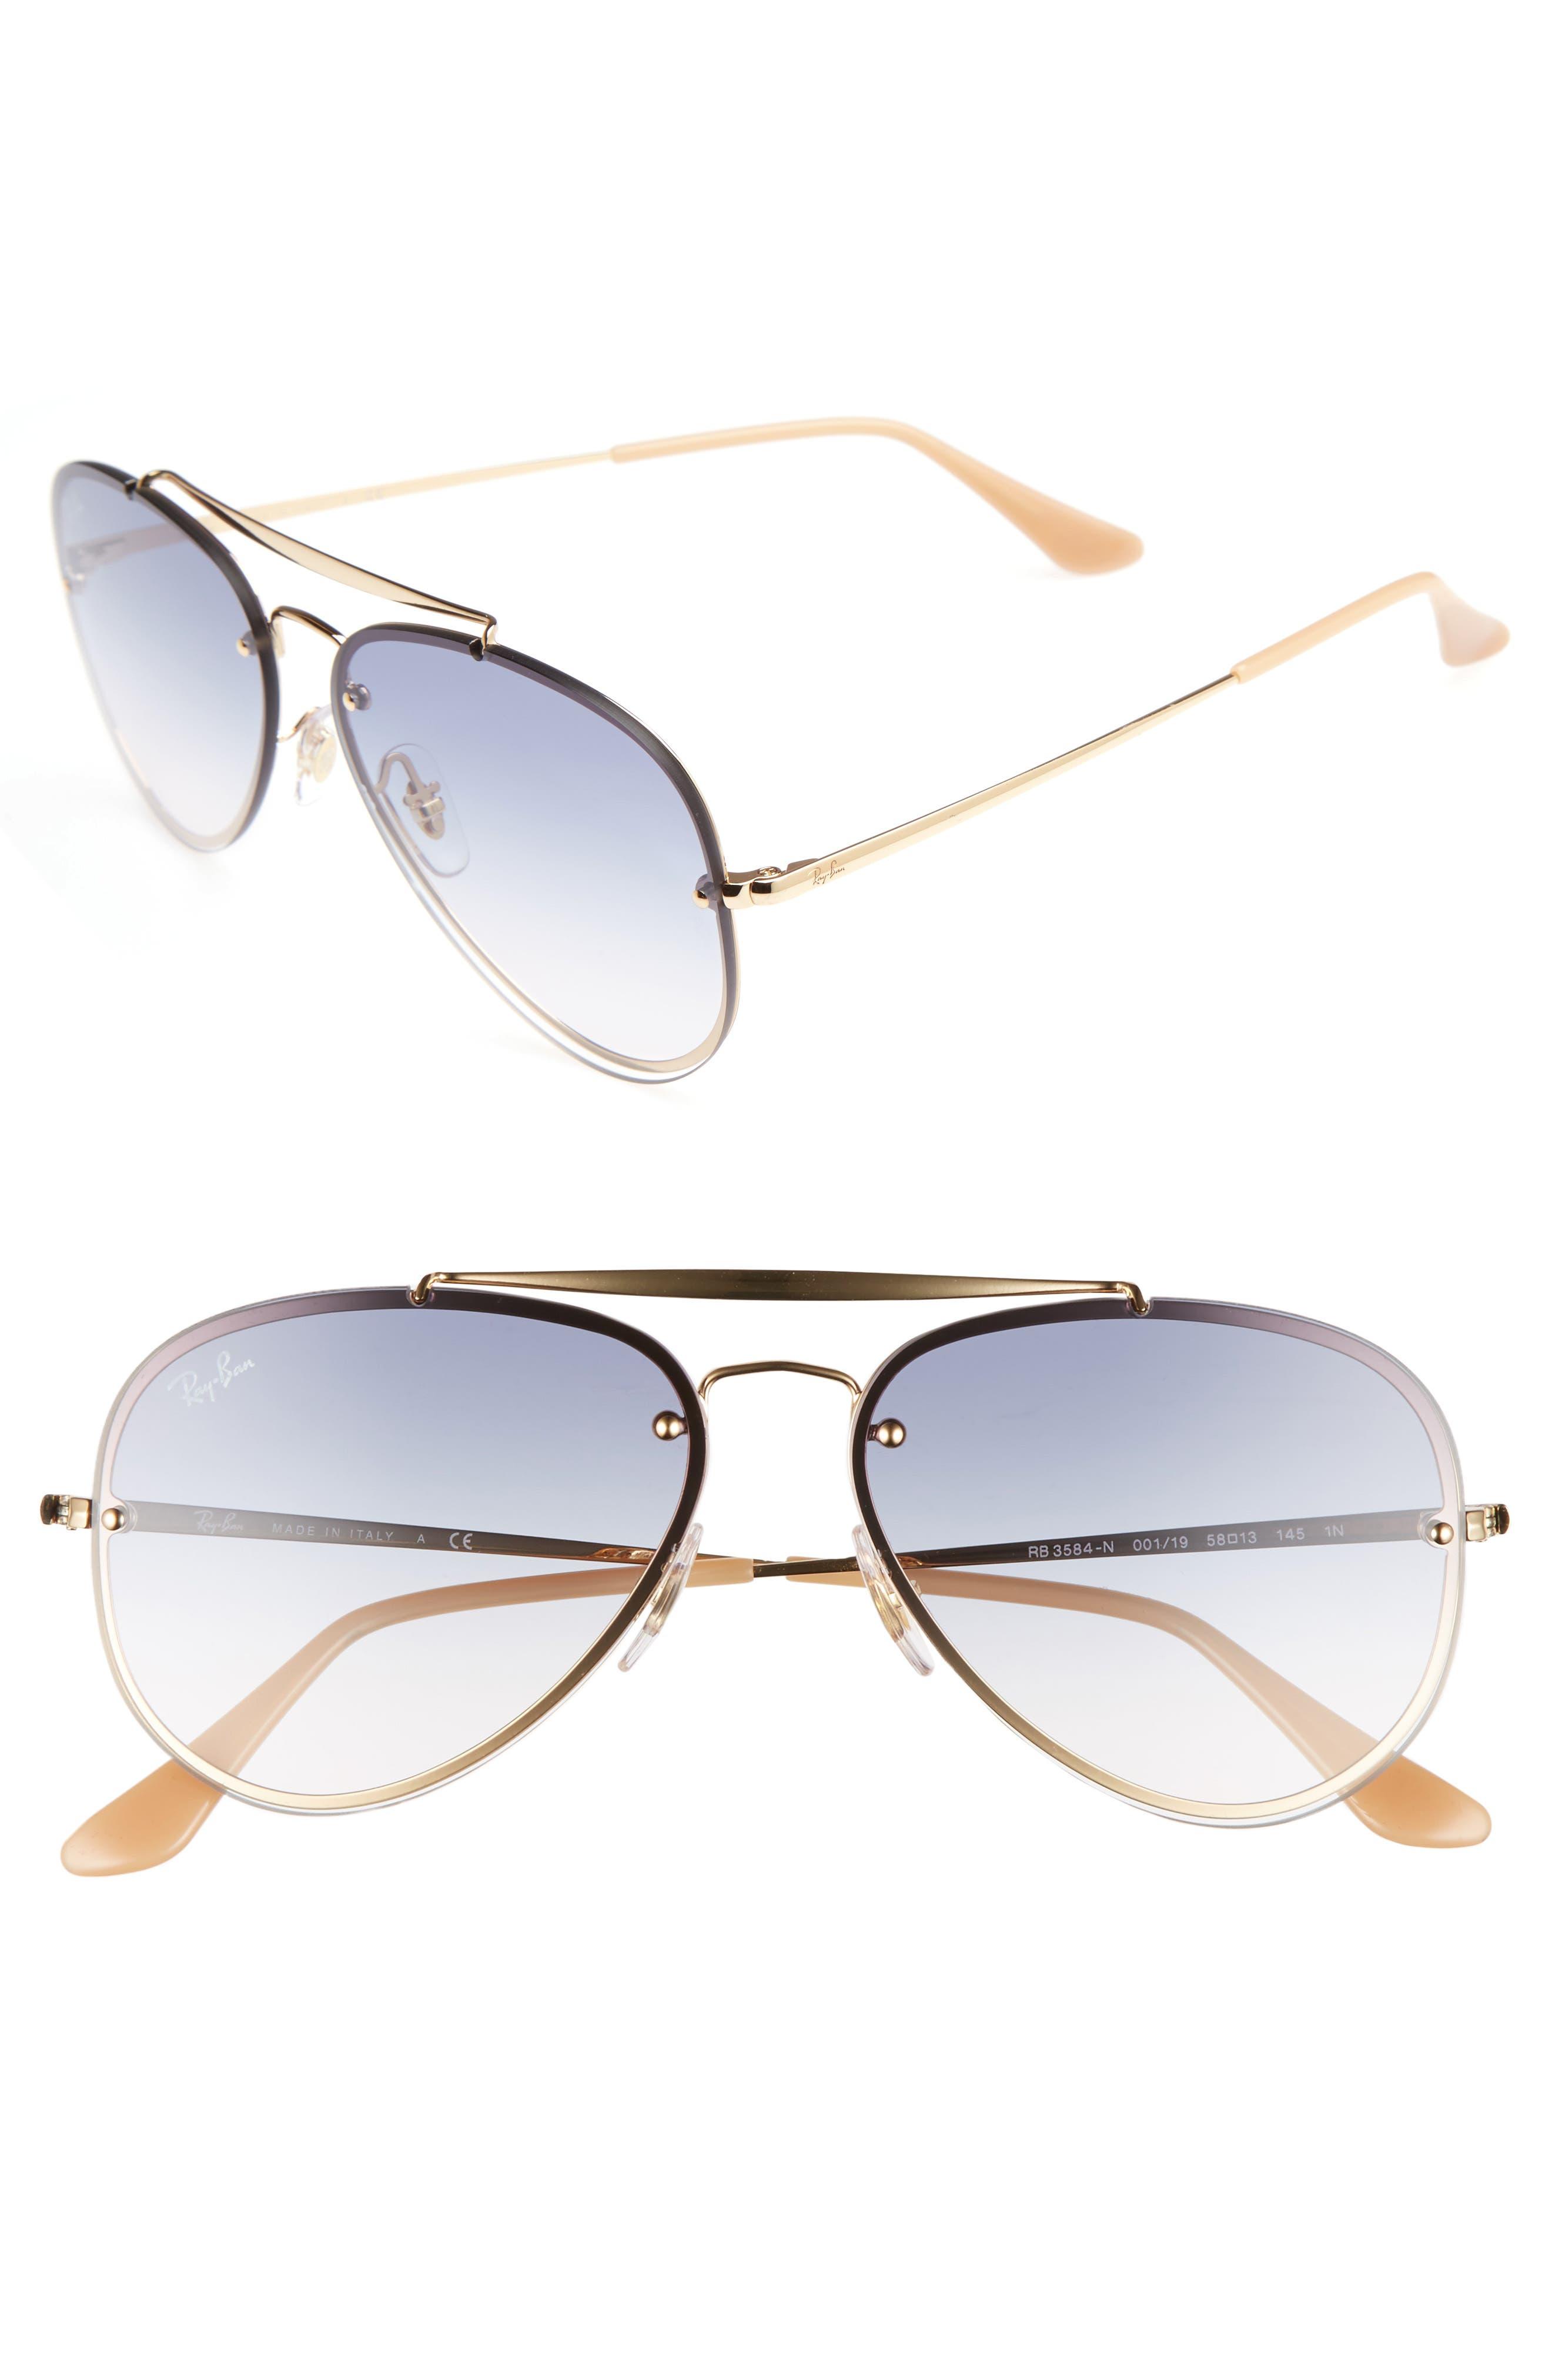 Ray-Ban 5m Aviator Sunglasses - Gold Blue